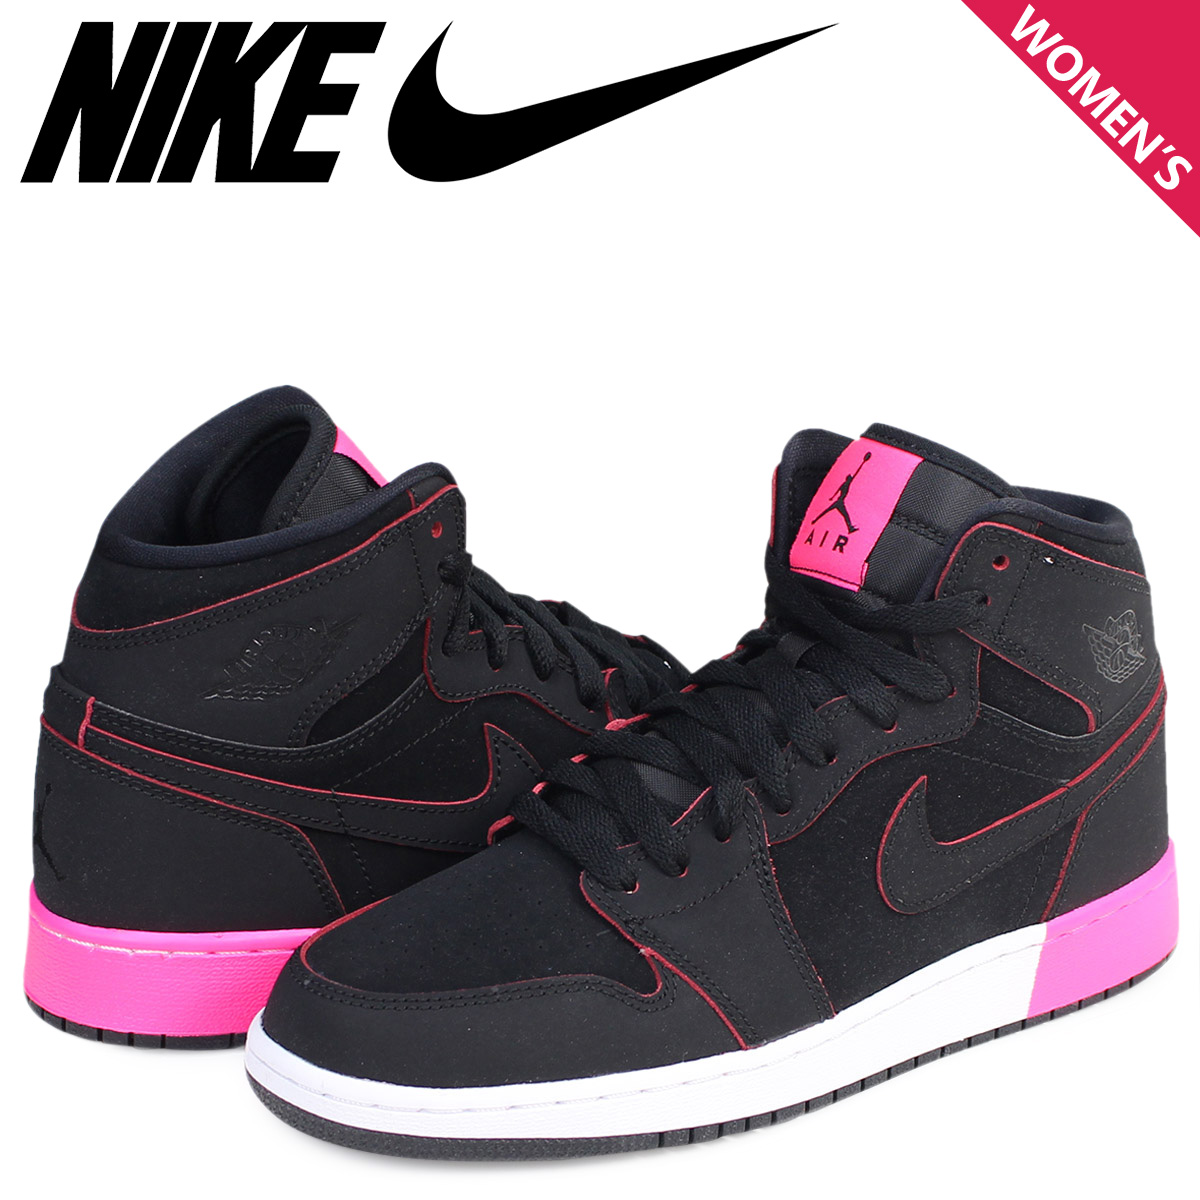 86e1a7eb4365c Sugar Online Shop: Nike NIKE Air Jordan 1 nostalgic lady's sneakers AIR  JORDAN 1 RETRO HIGH GS 332,148-024 shoes black [7/21 Shinnyu load] |  Rakuten Global ...